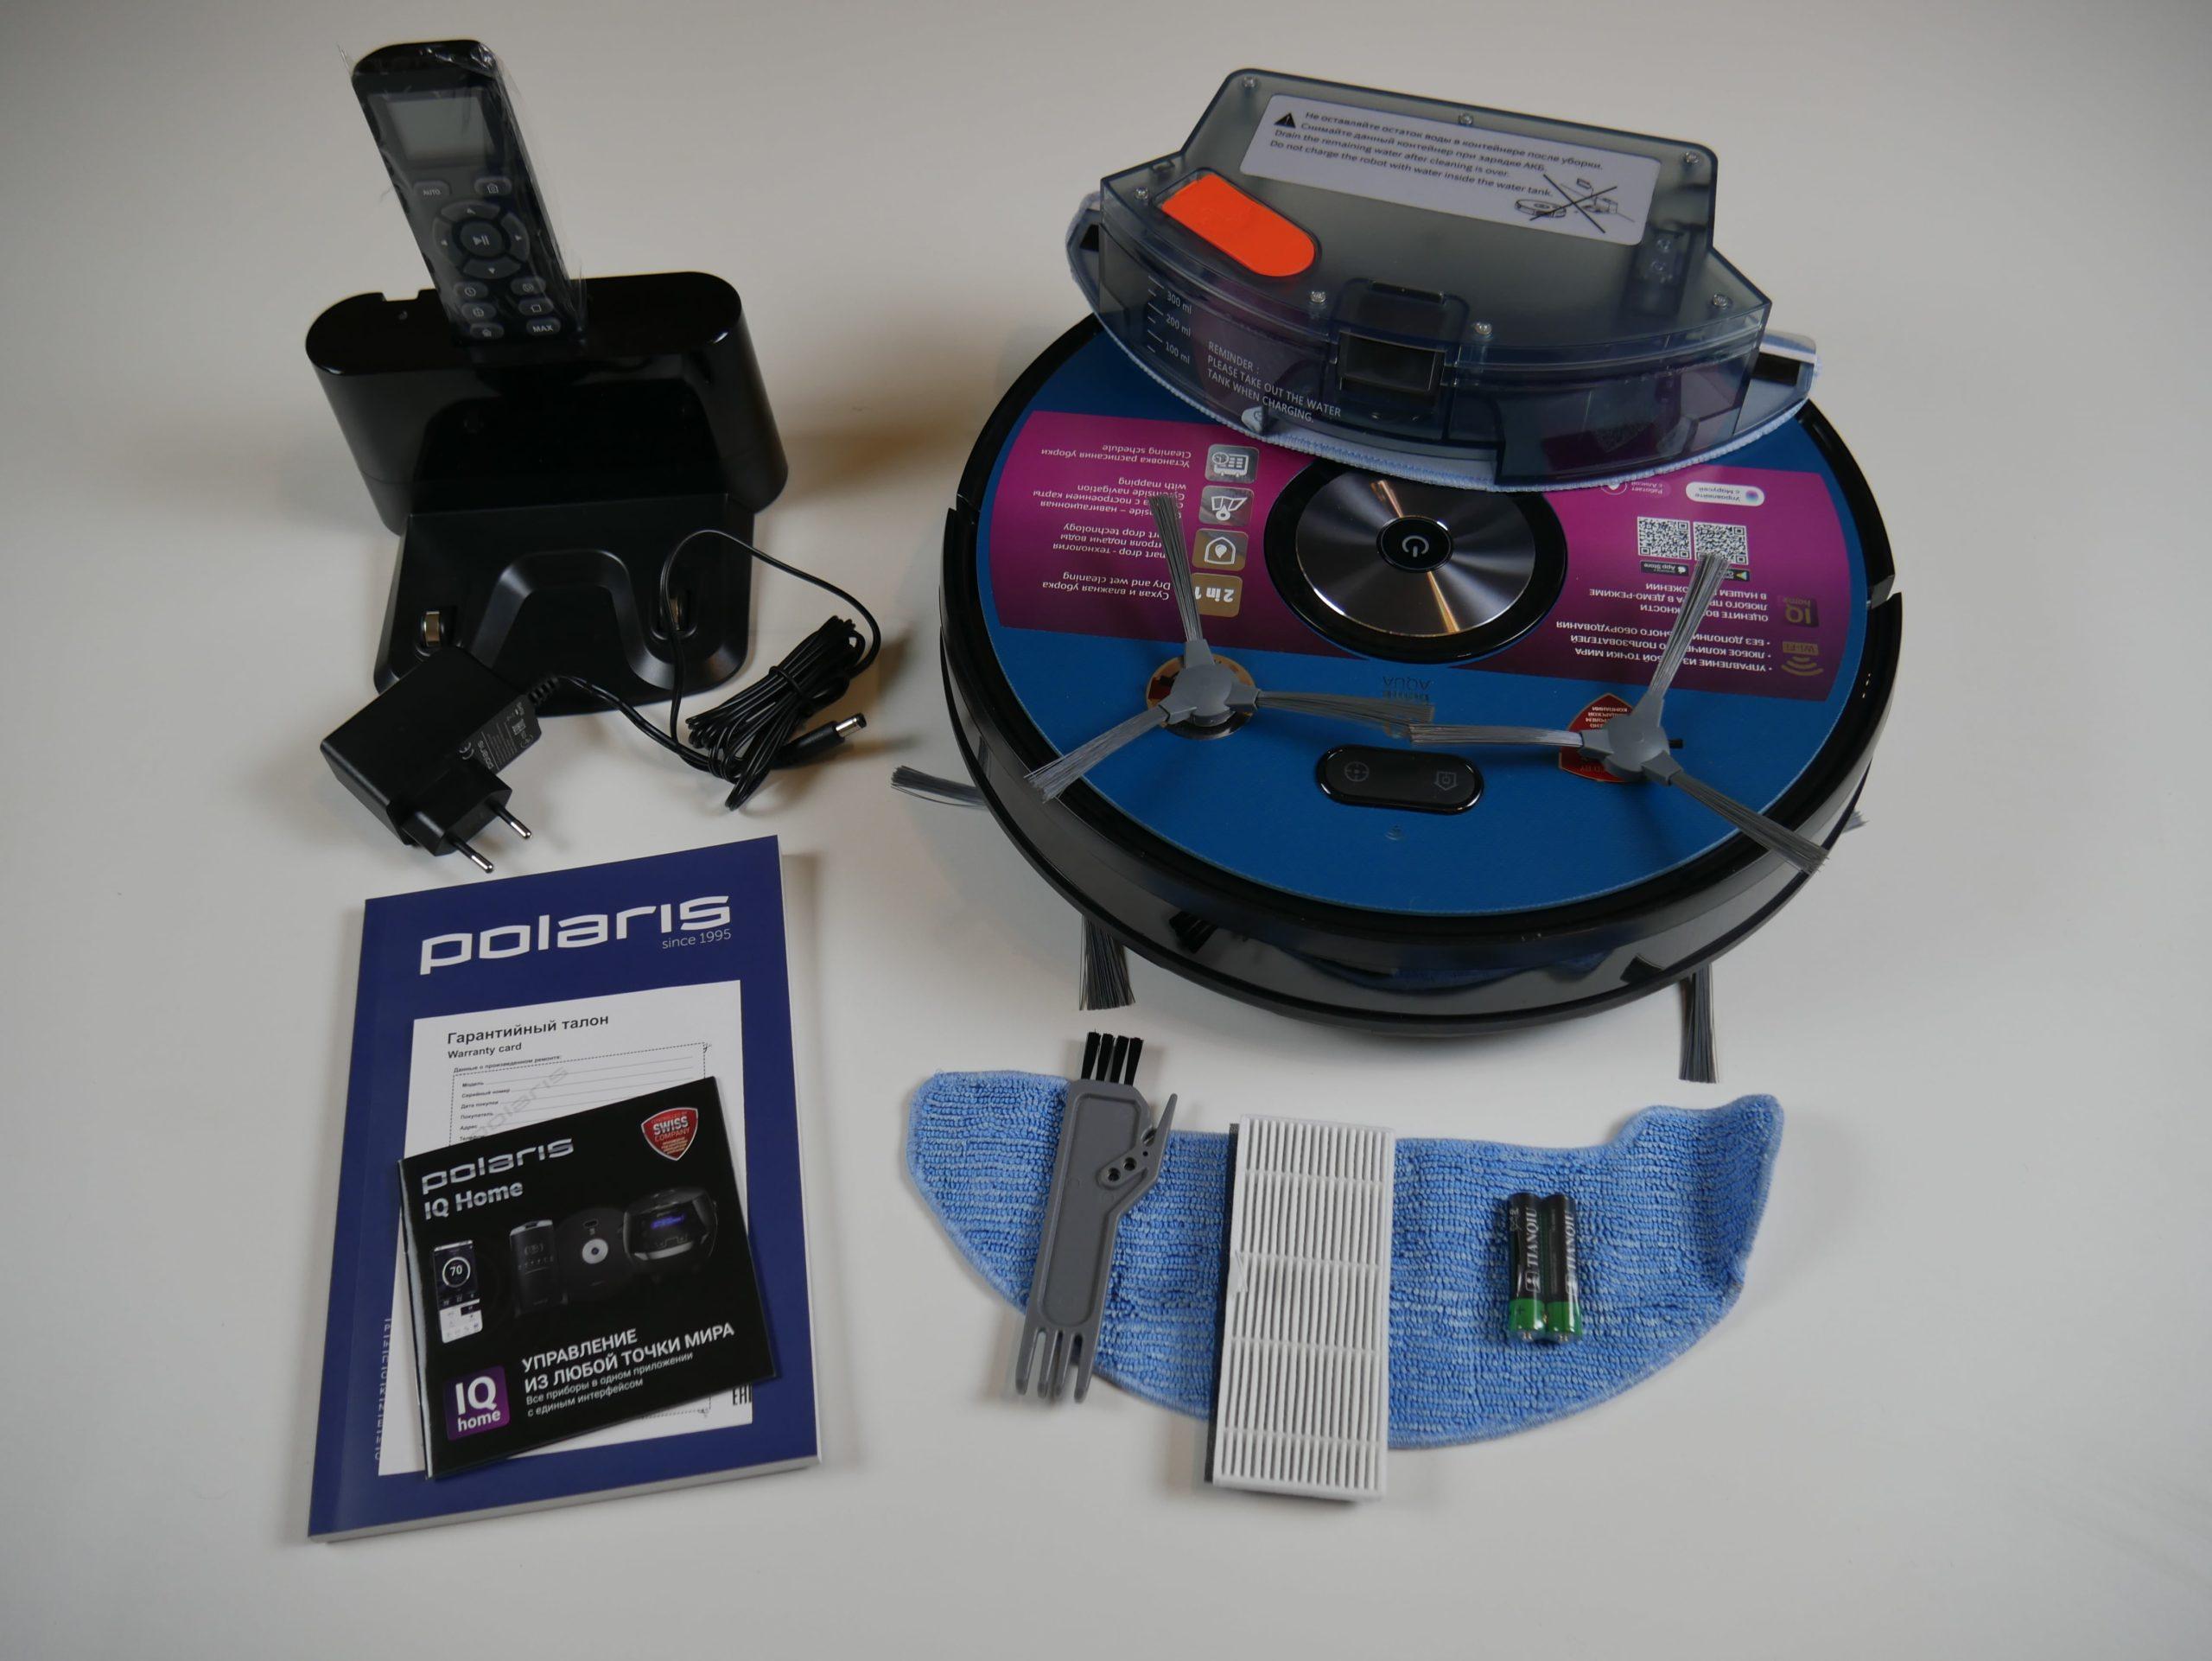 Polaris PVCR 3200 IQ Home Aqua комплектация